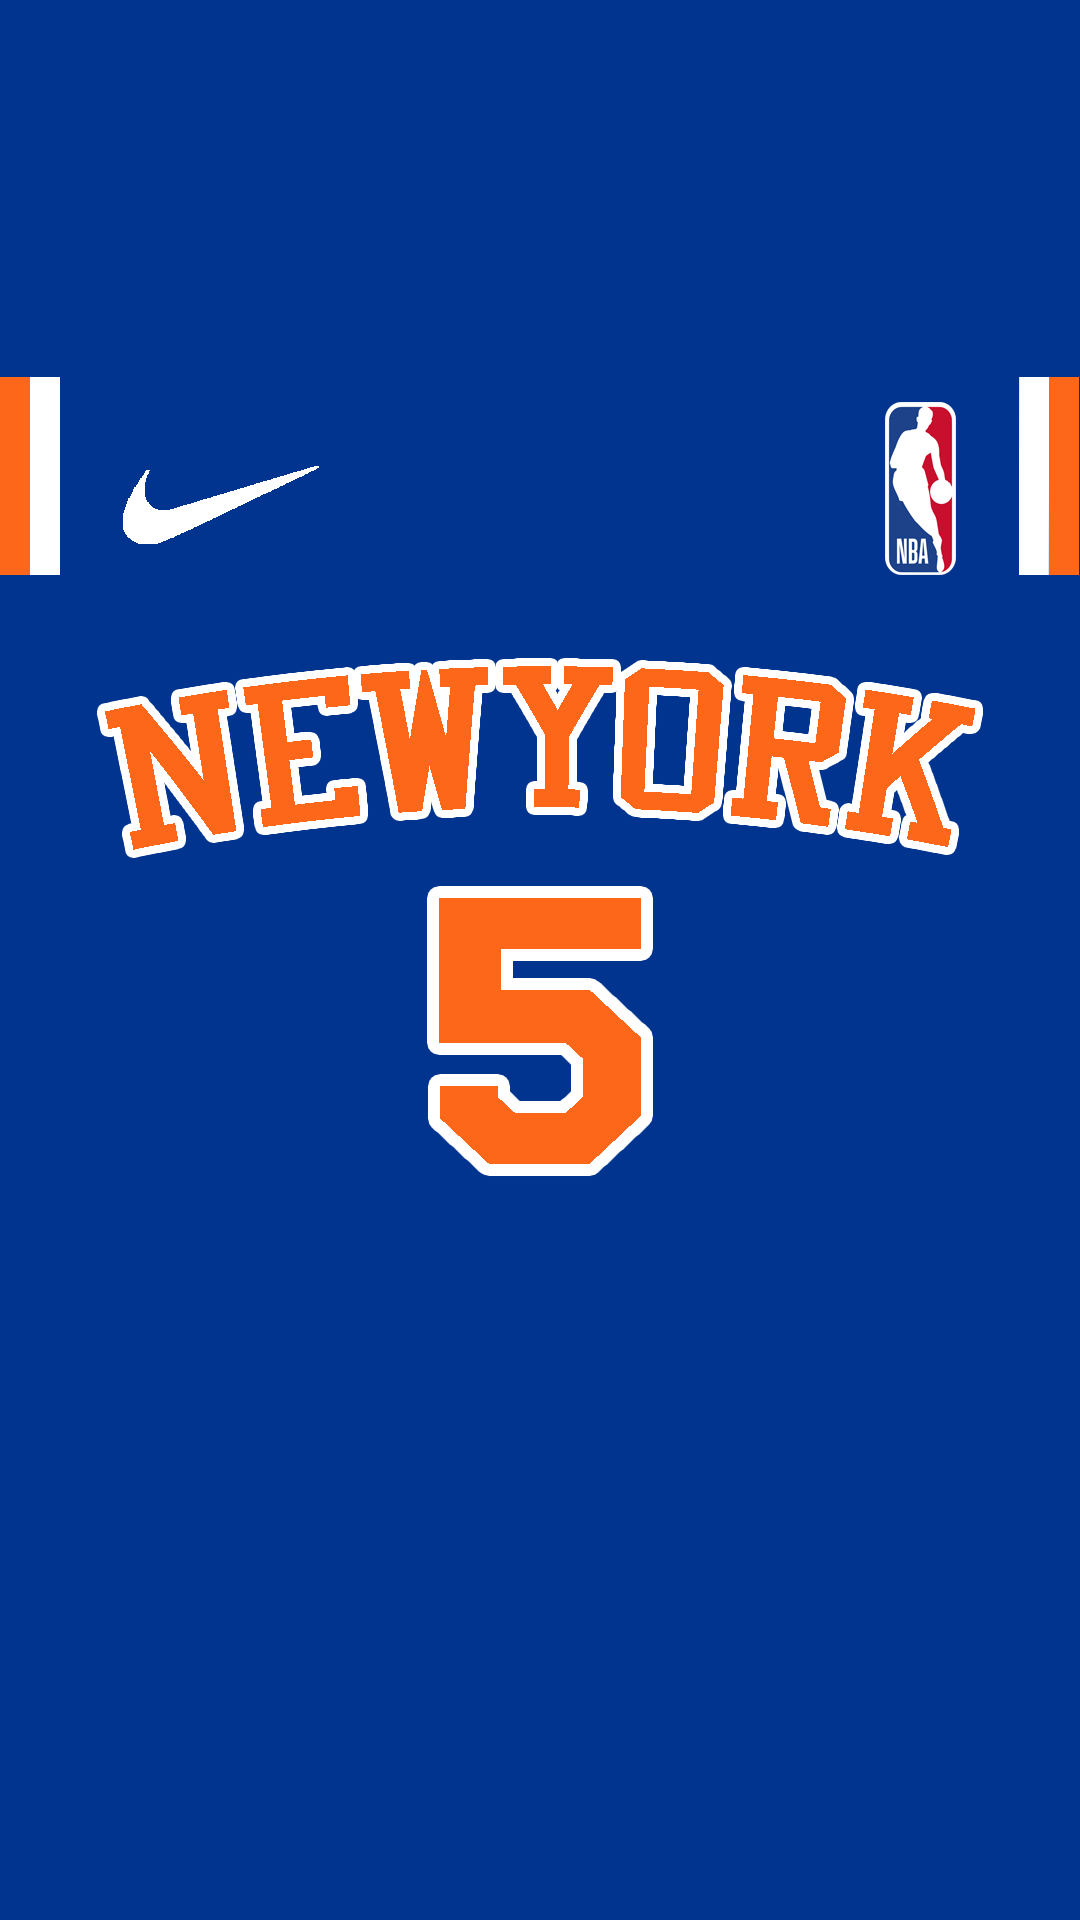 Knicks Smith Jr Knicks Nba Jersey Nba Kings